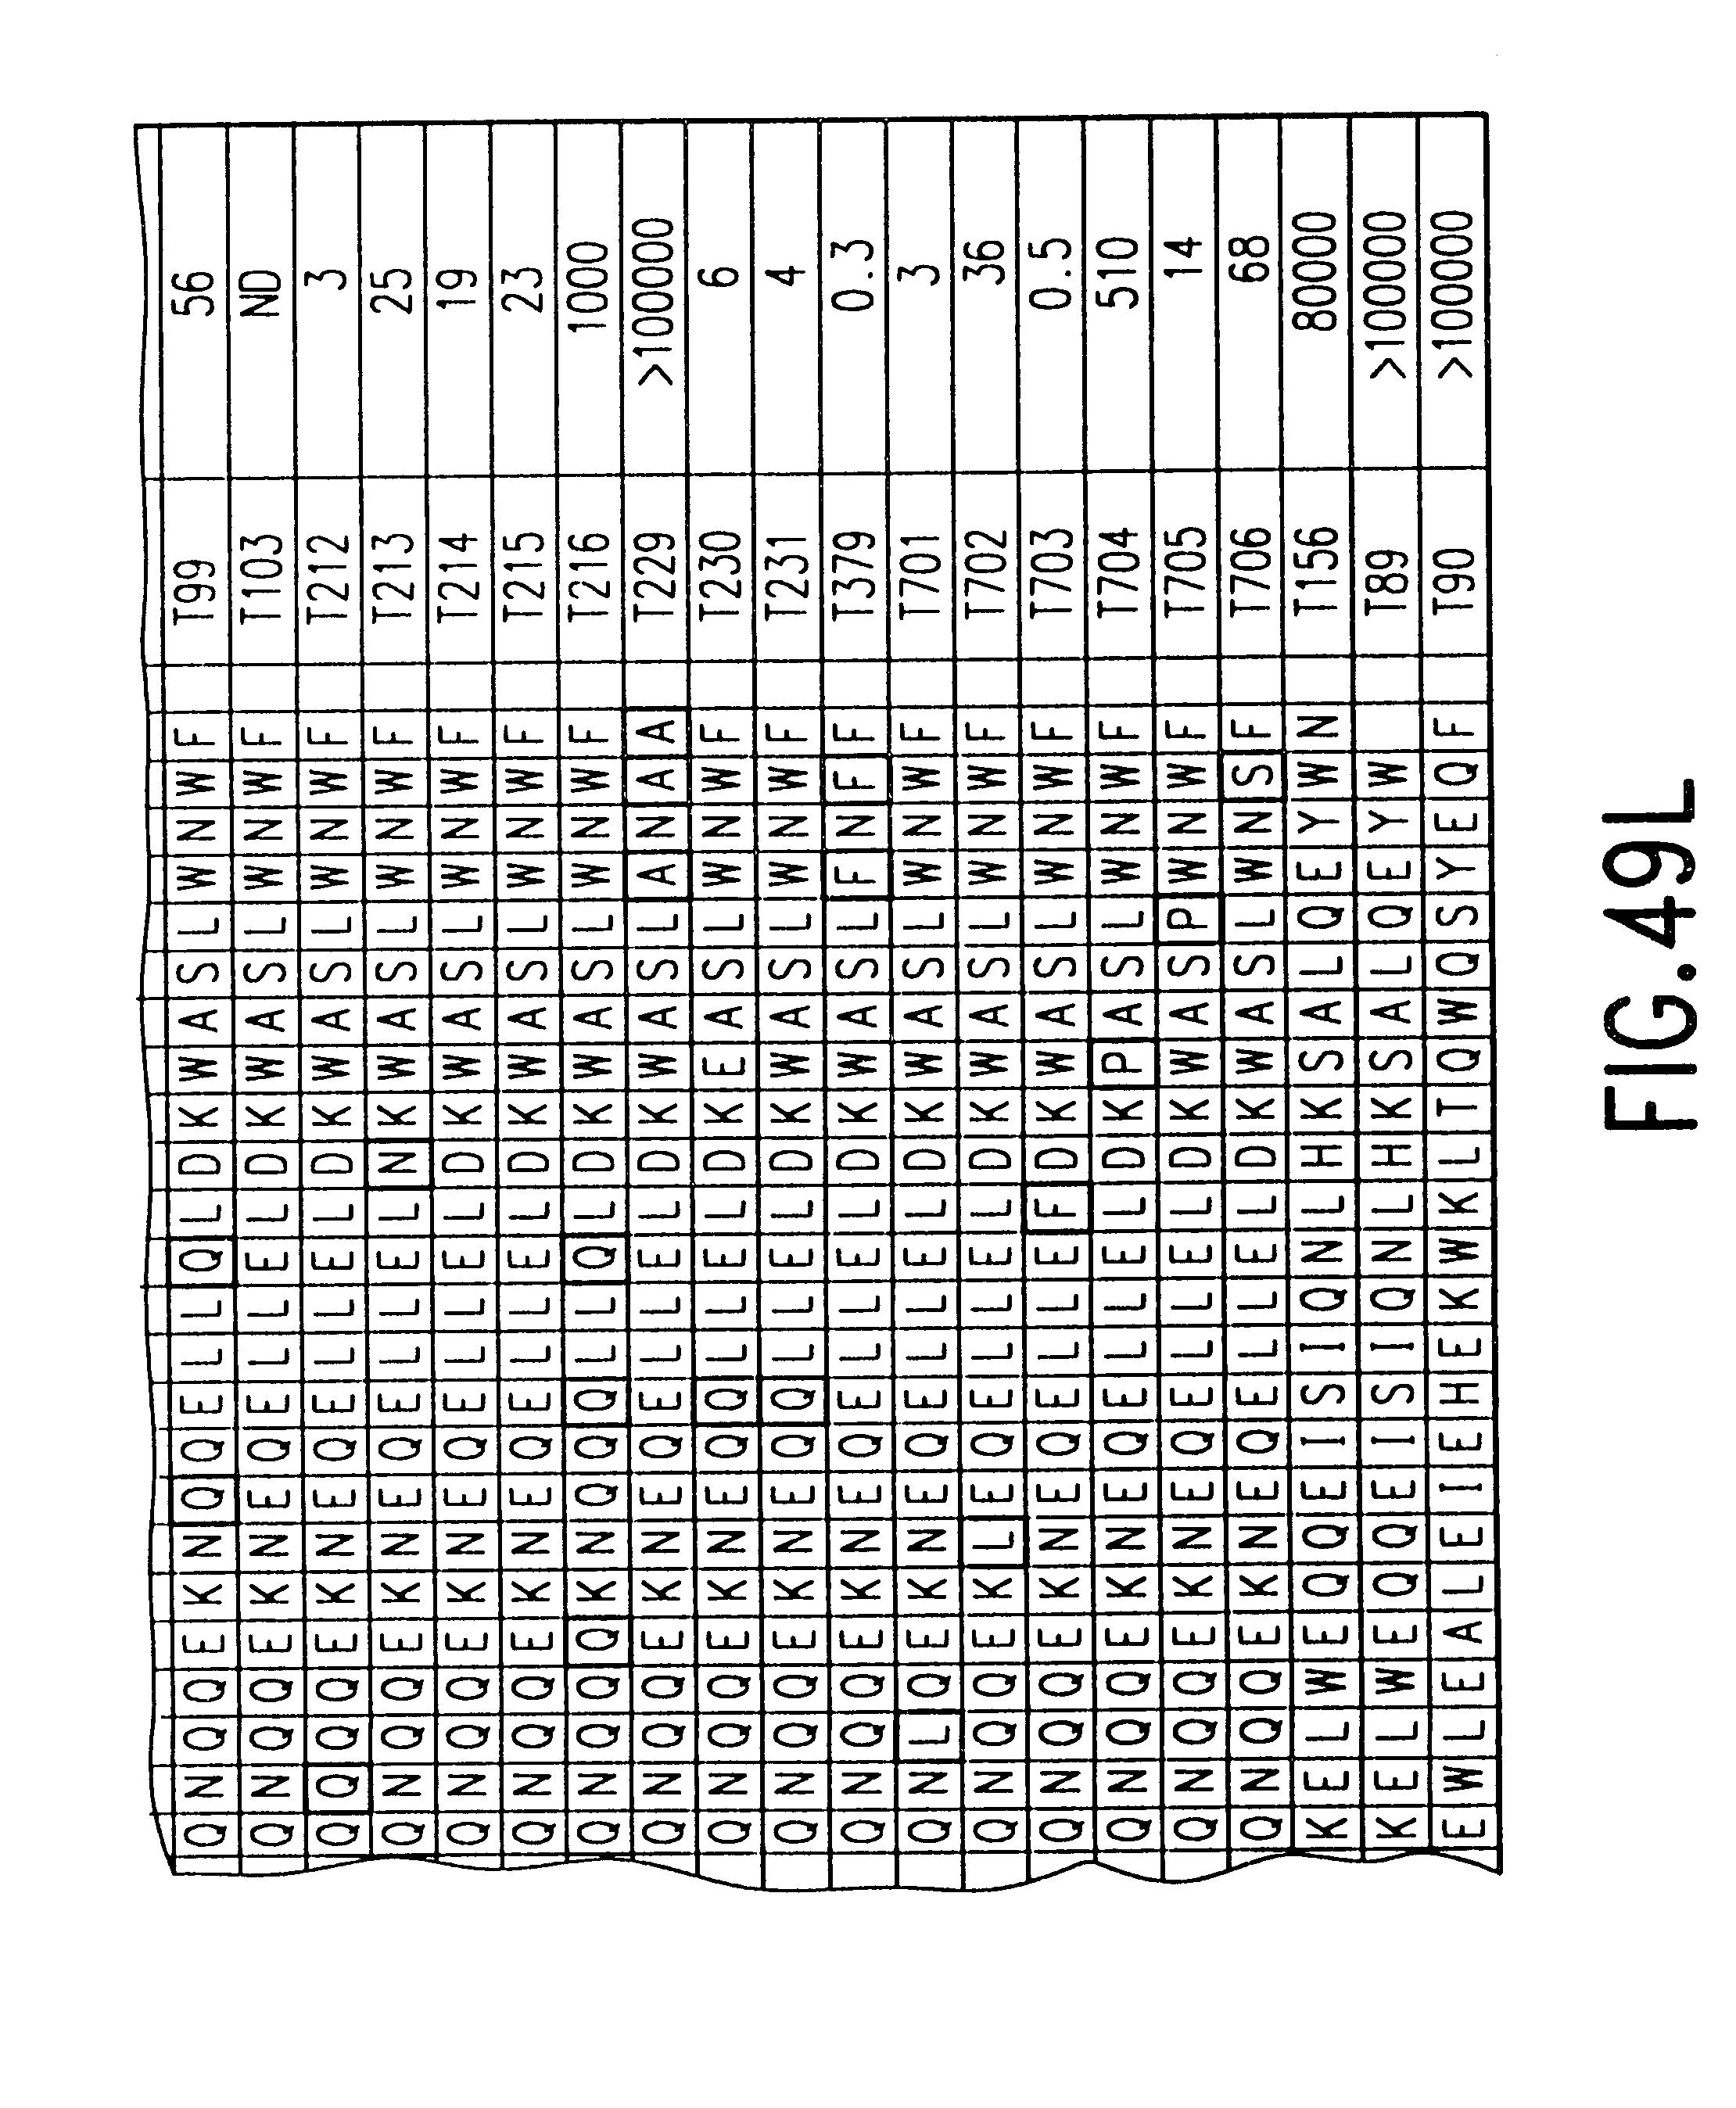 Patent Us 6228983 B1 1991 Volkswagen Fox 18 Fuse Box Diagram 0 Petitions